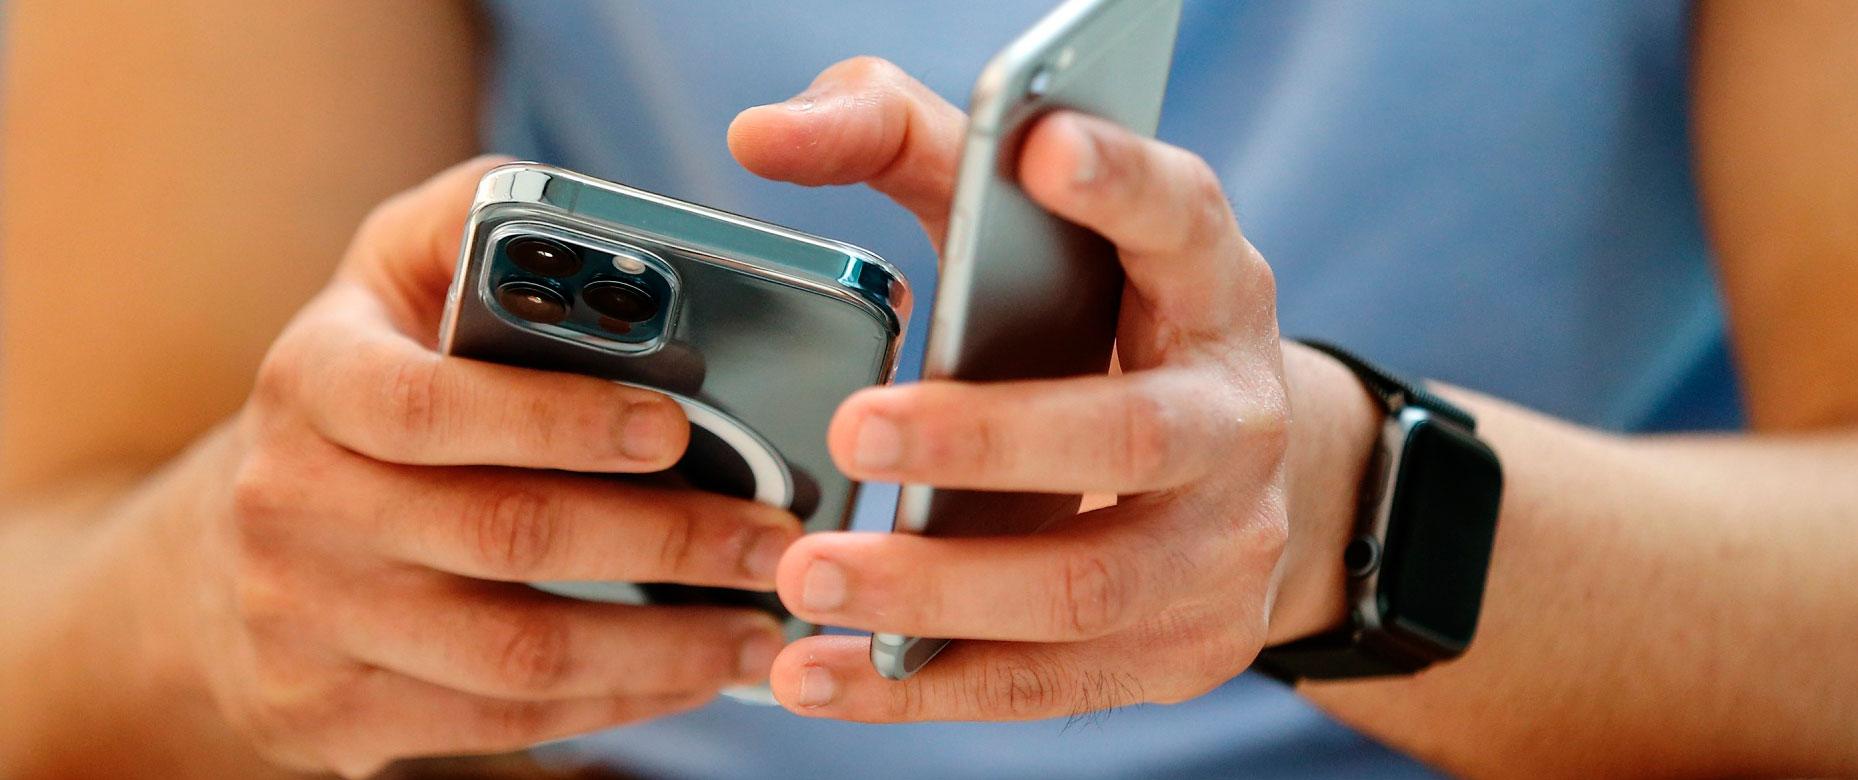 https://www.macfreak.nl/modules/news/images/zArt.iPhone12ProMetGebruiker.jpg